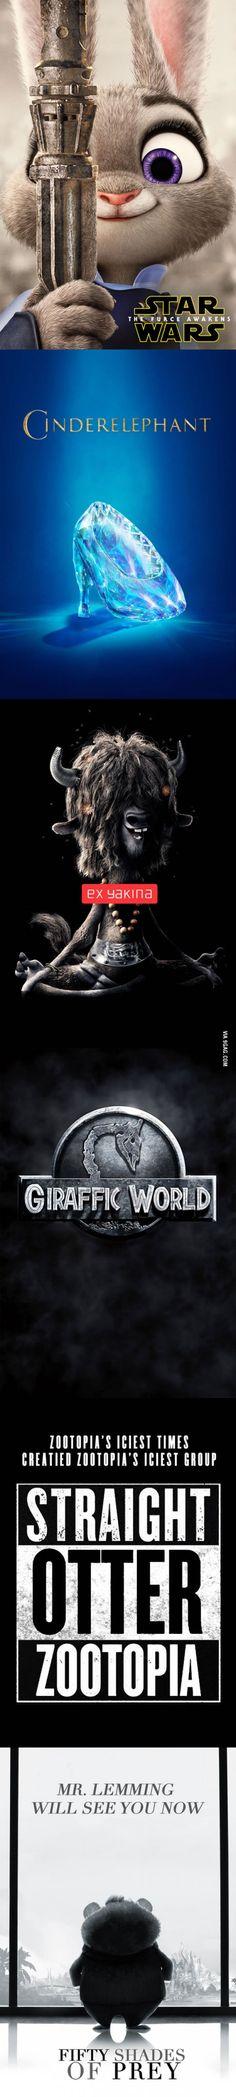 'Zootopia' Official Spoof Posters https://www.wish.com/merchant/hiidea